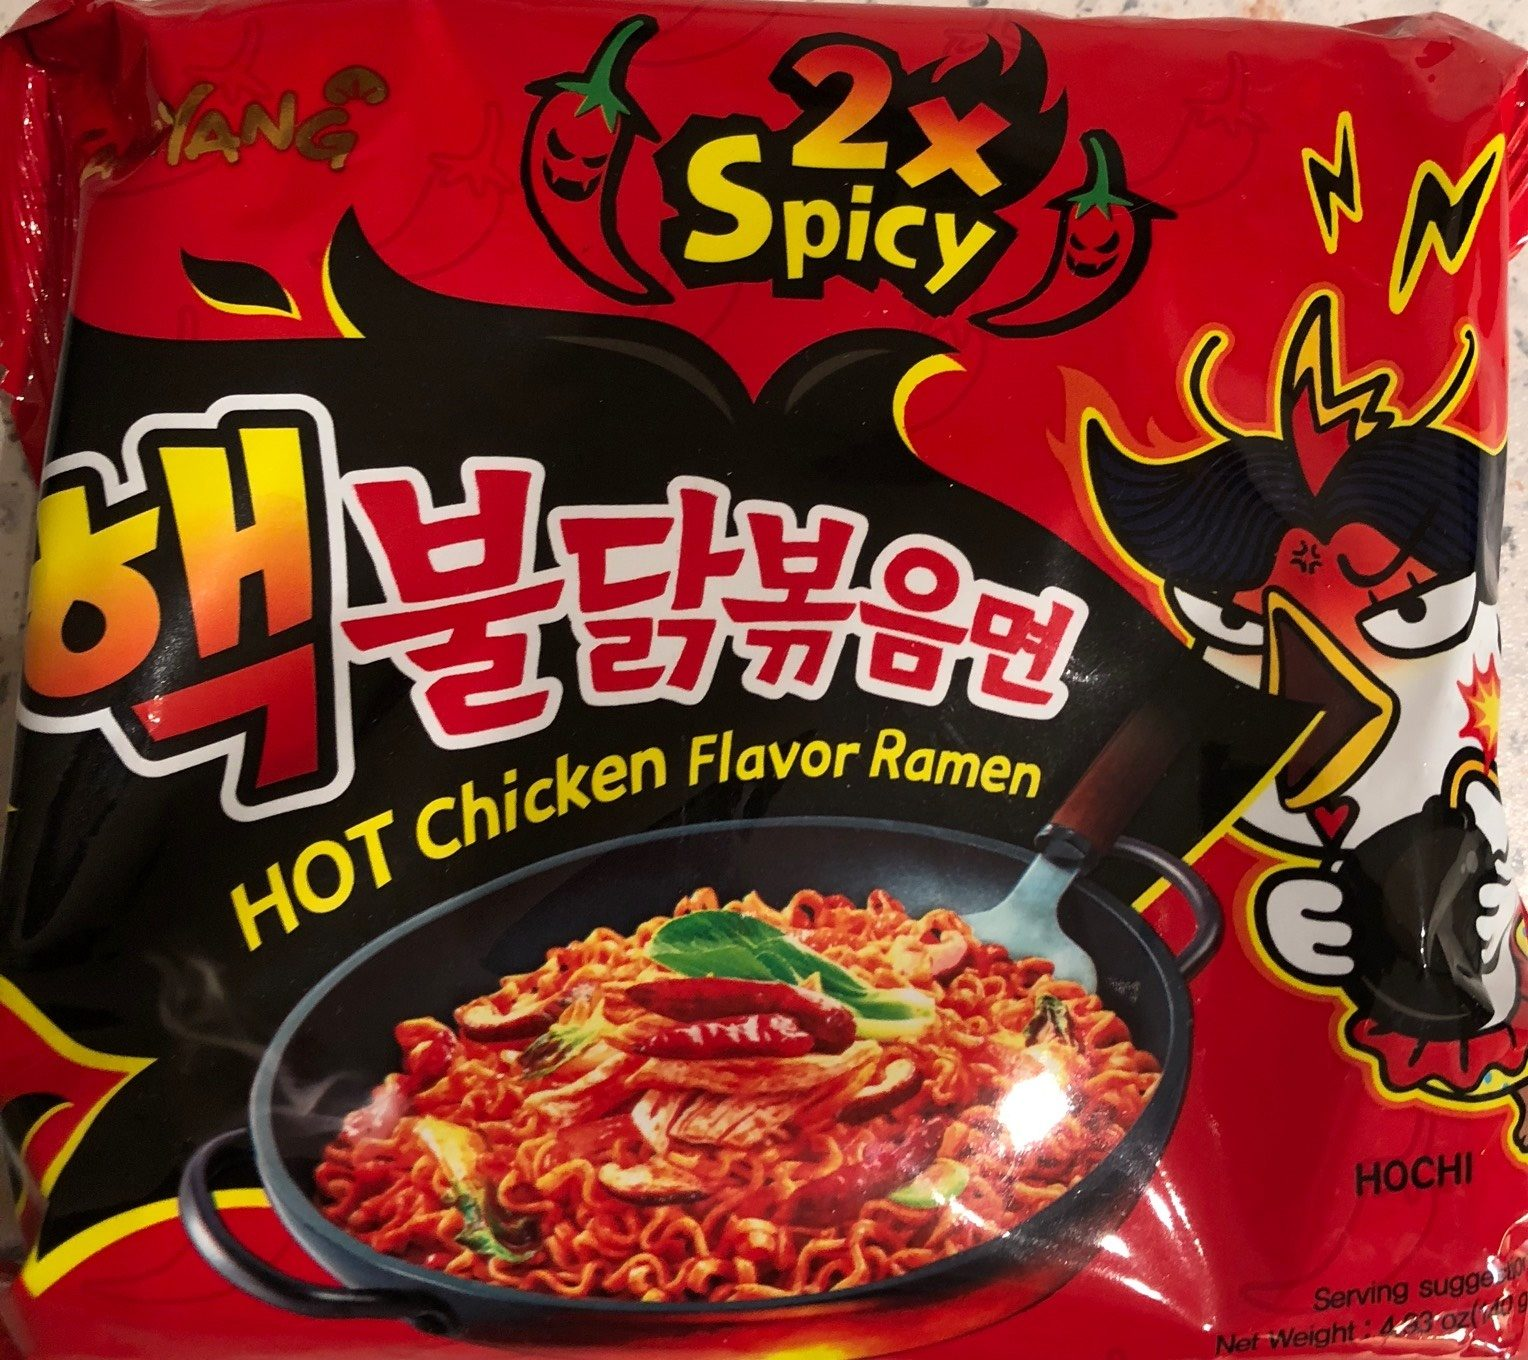 Samyang Hot Chicken Flavour Ramen (2xspicy) Limited Edition - Produit - en